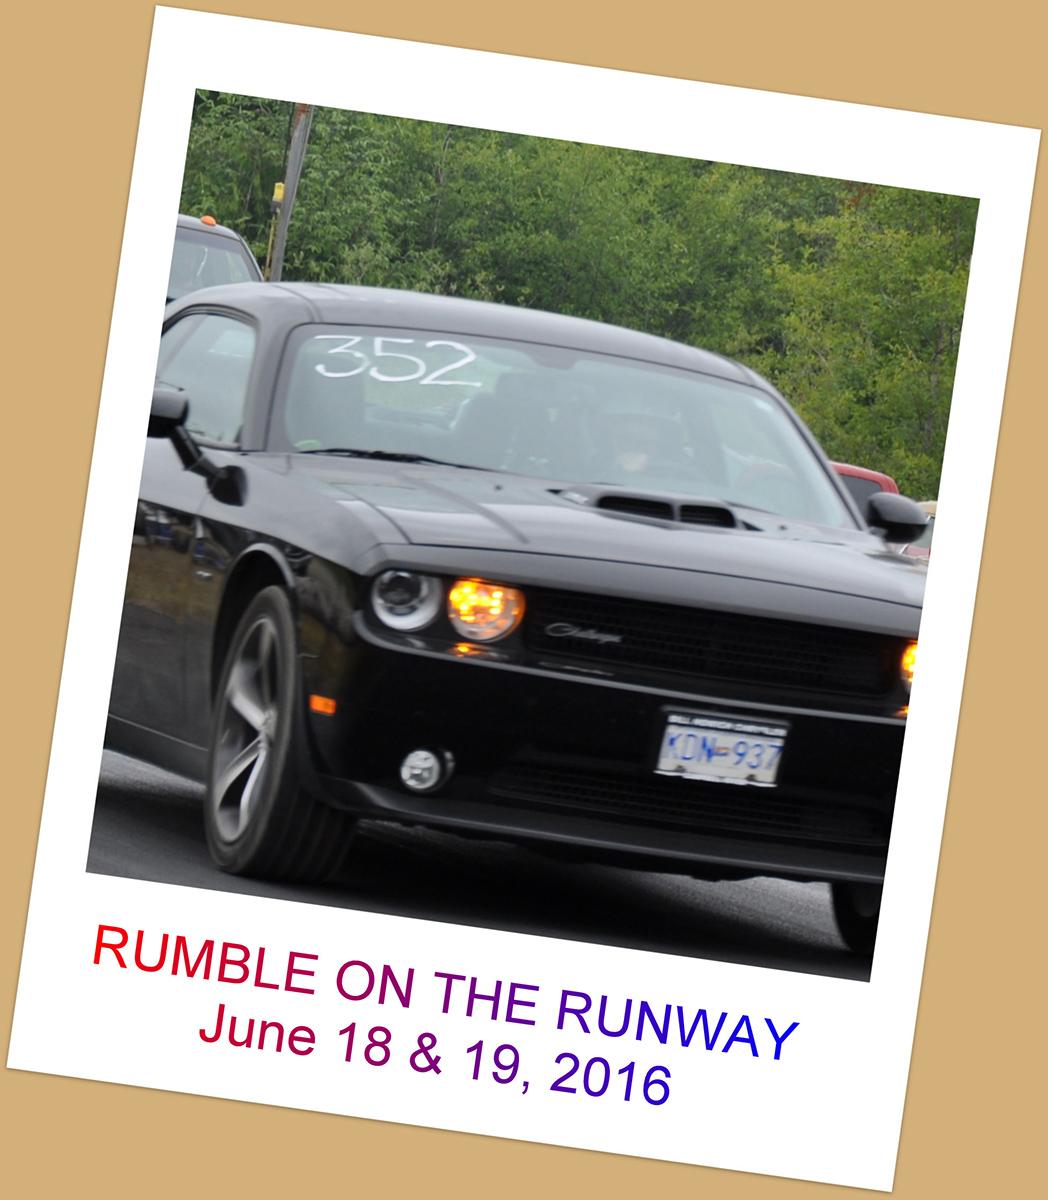 Rumble on the Runway June 18 & 19, 2016 1031